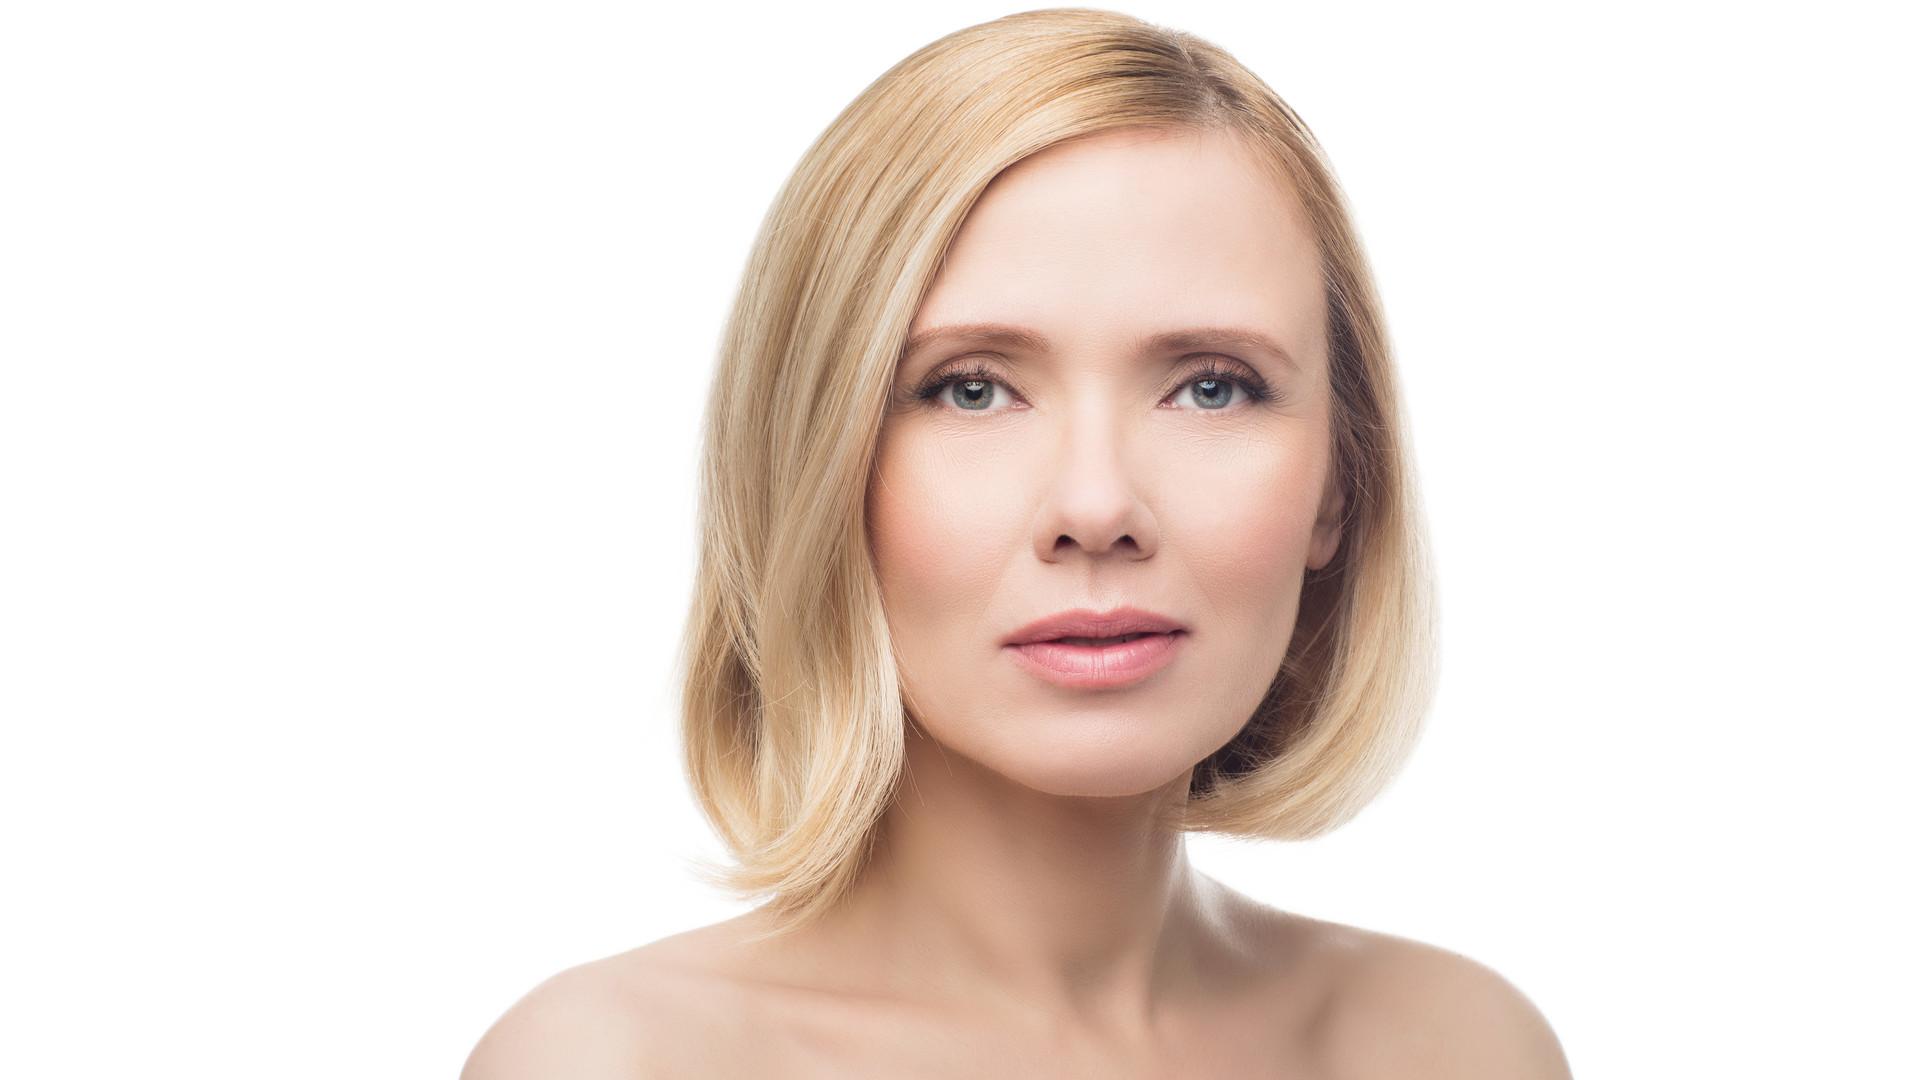 Porträt blonde Frau